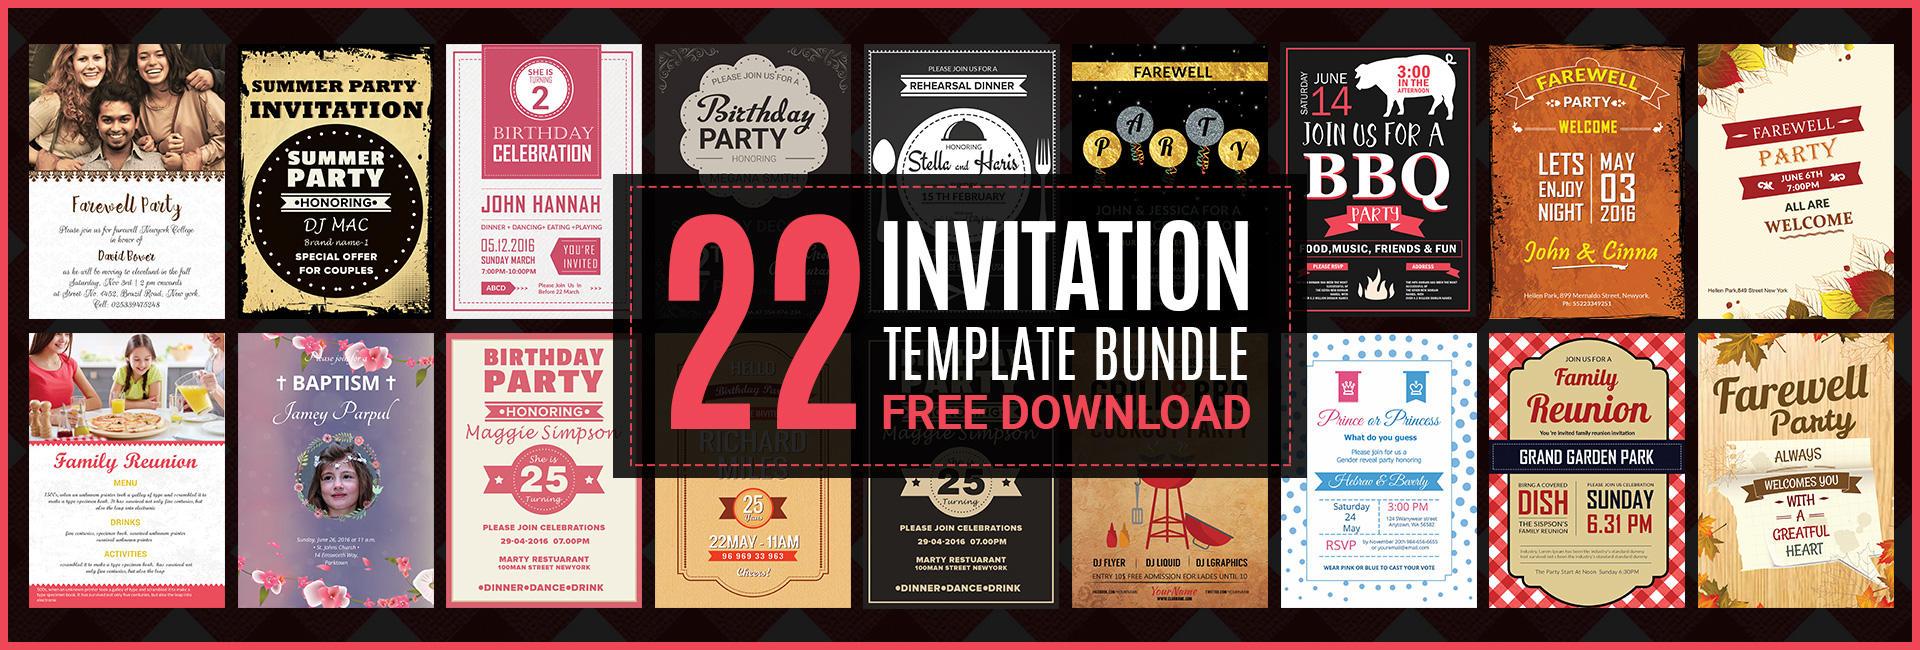 49+ Free Invitation Templates - Wedding, Birthday, Dinner, Reunion | Free &  Premium Templates